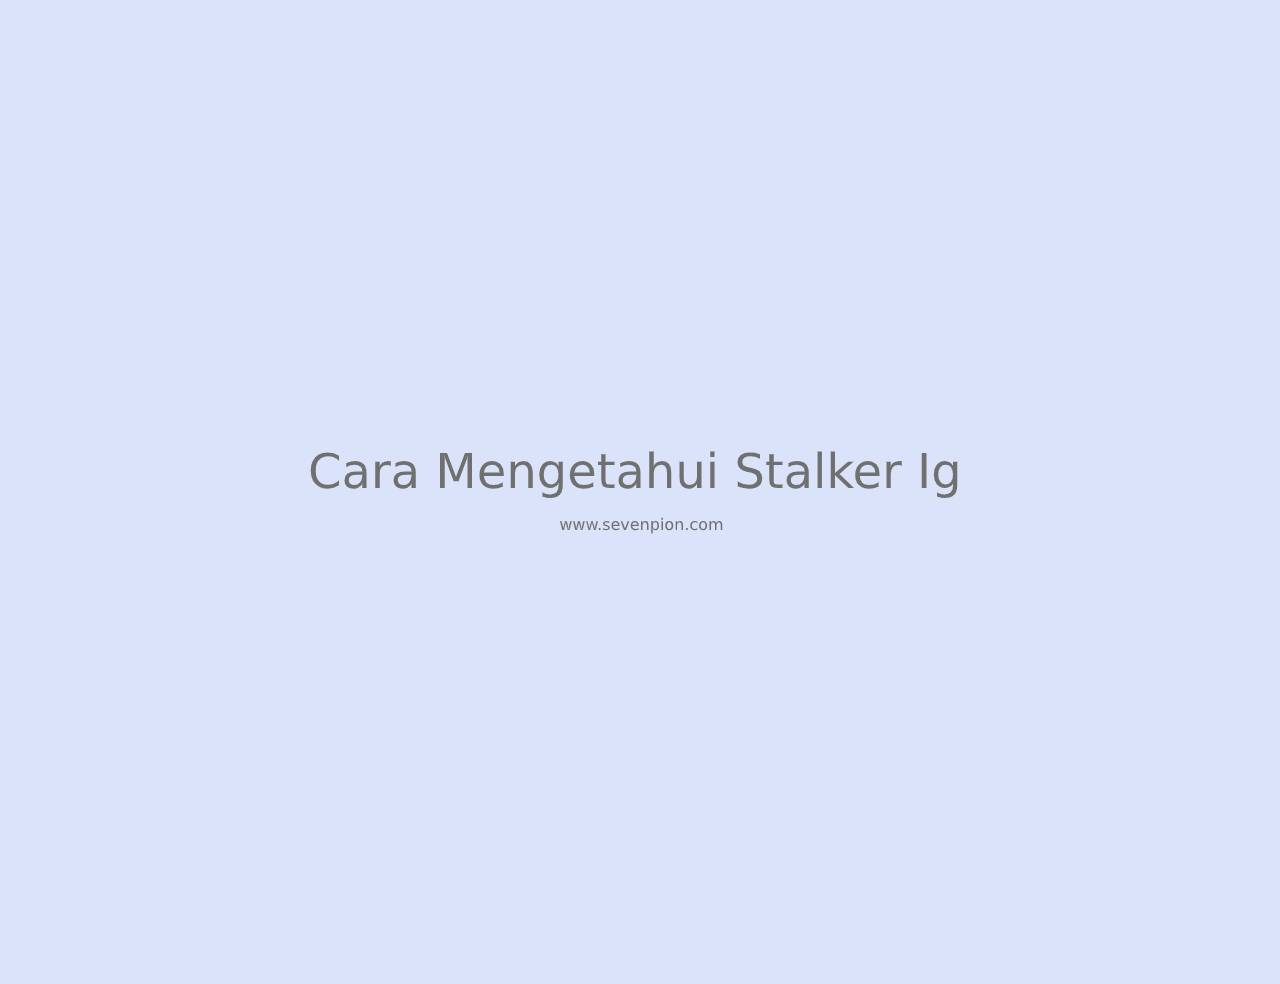 cara mengetahui stalker ig